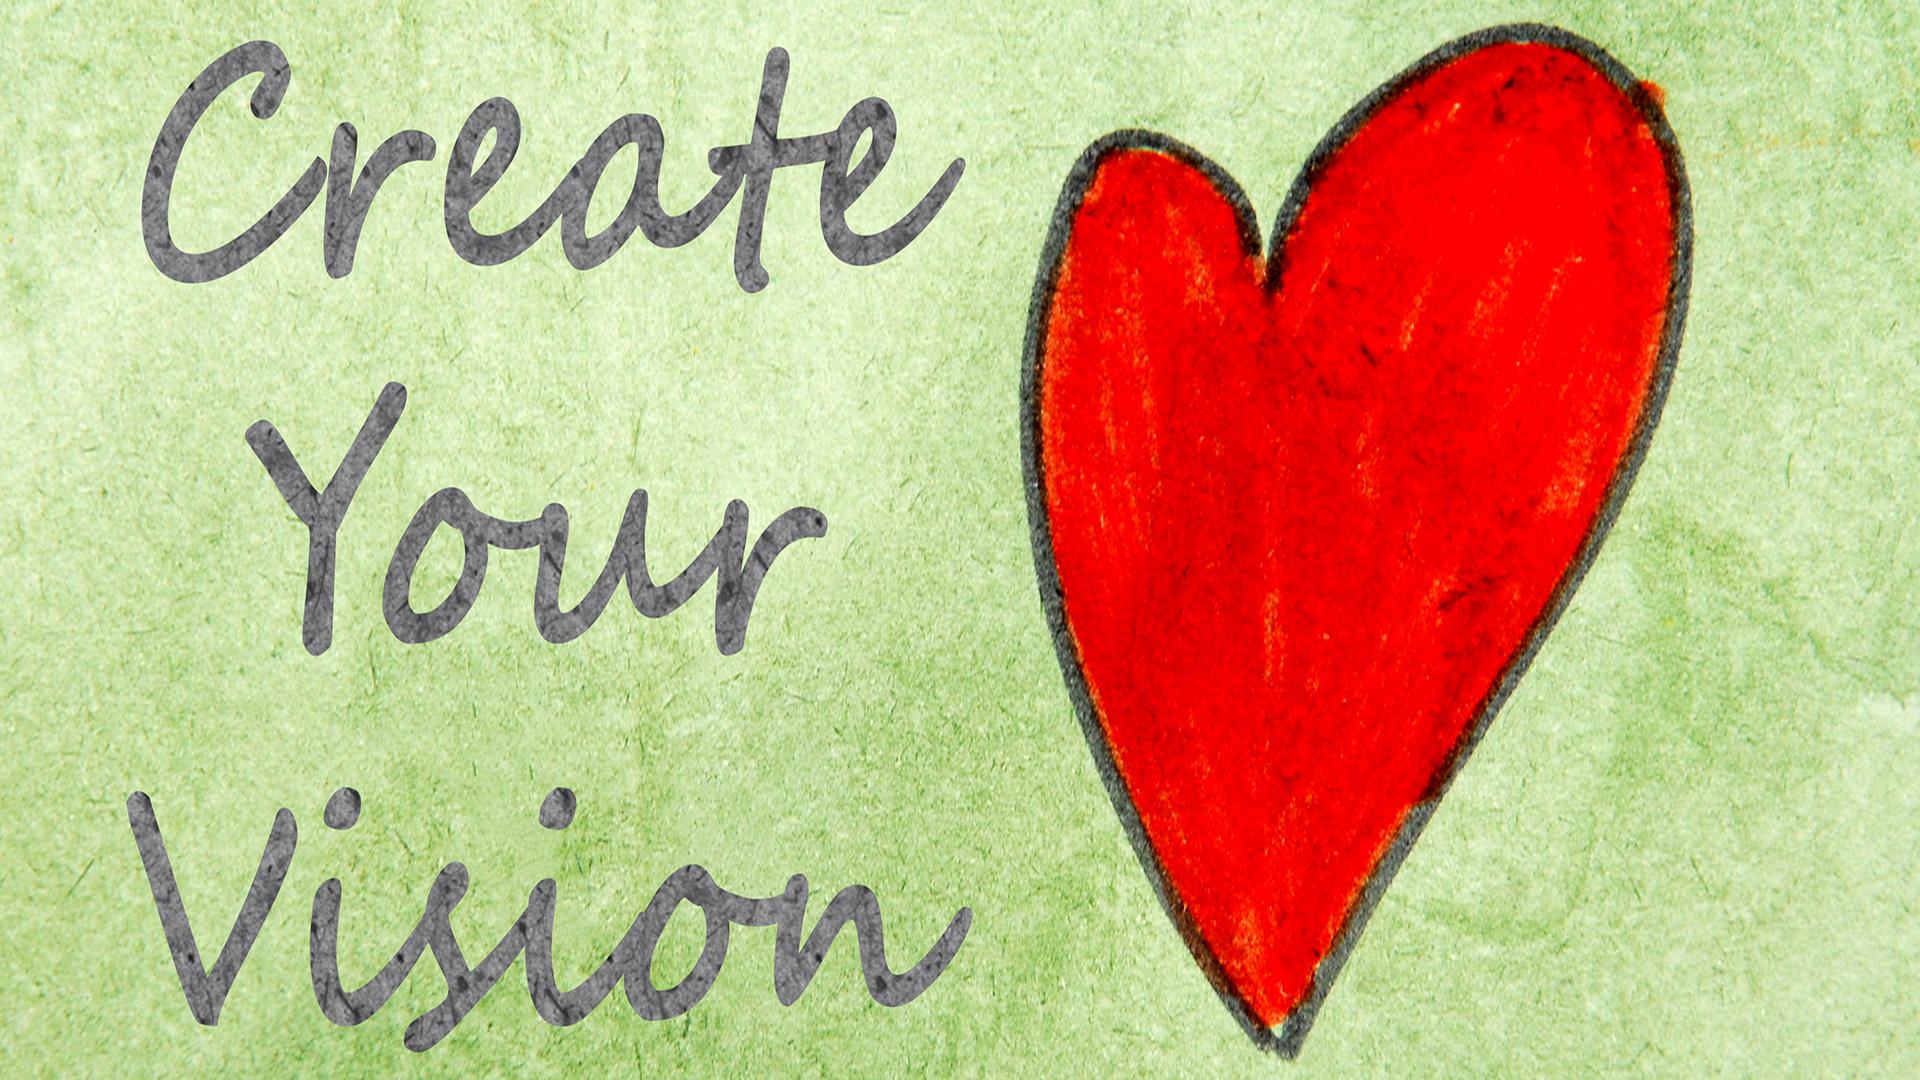 Powerful life vision